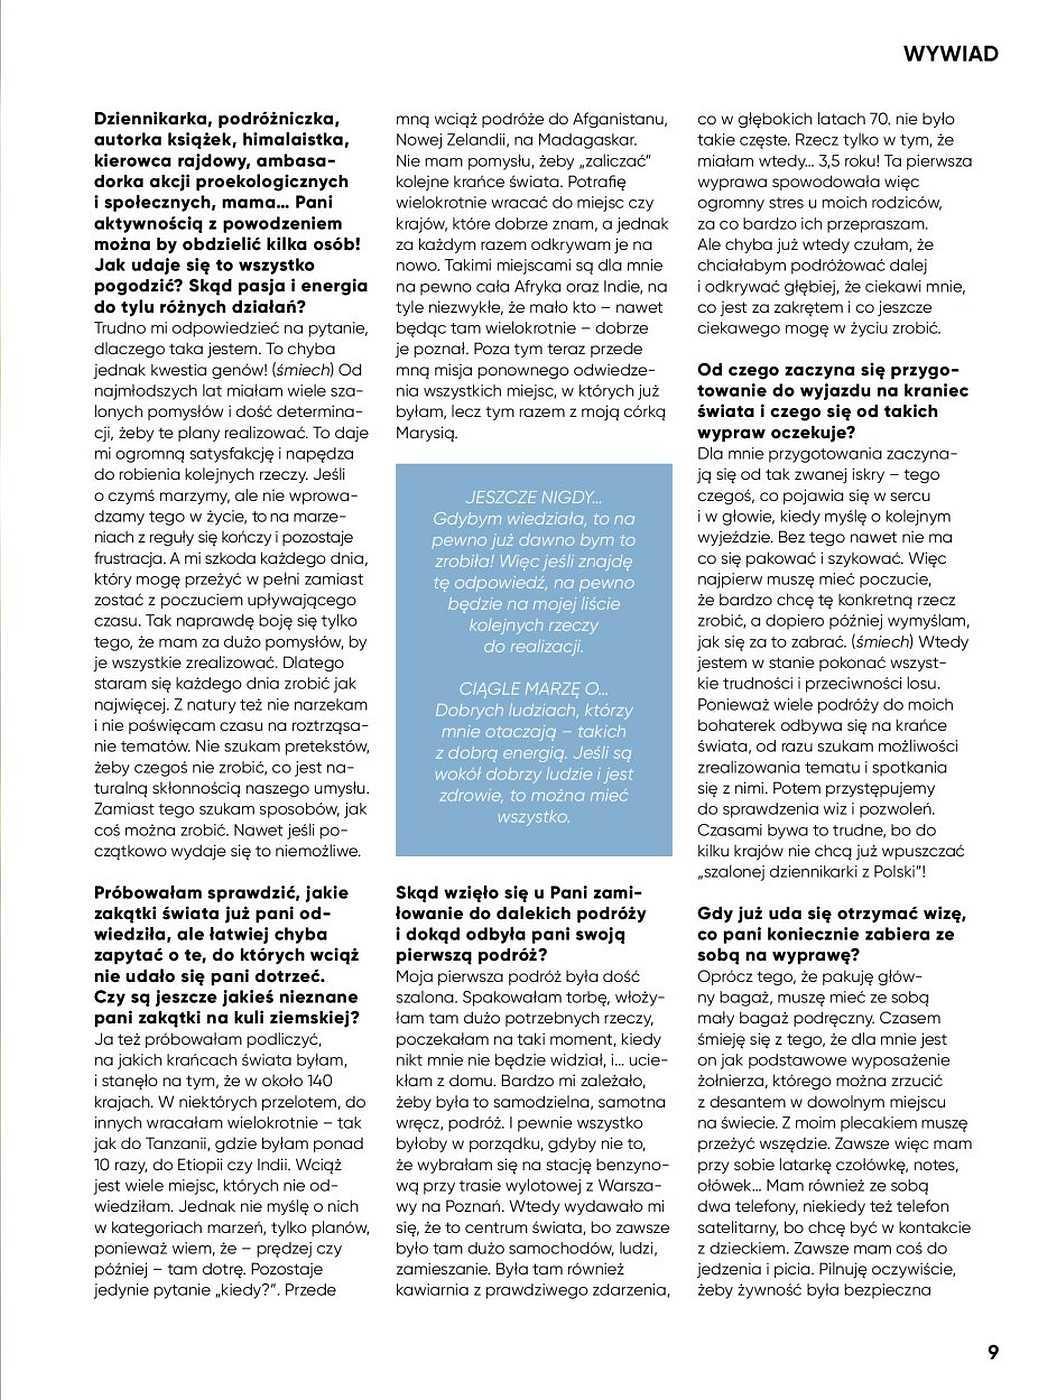 Gazetka promocyjna Tesco do 31/12/2018 str.9